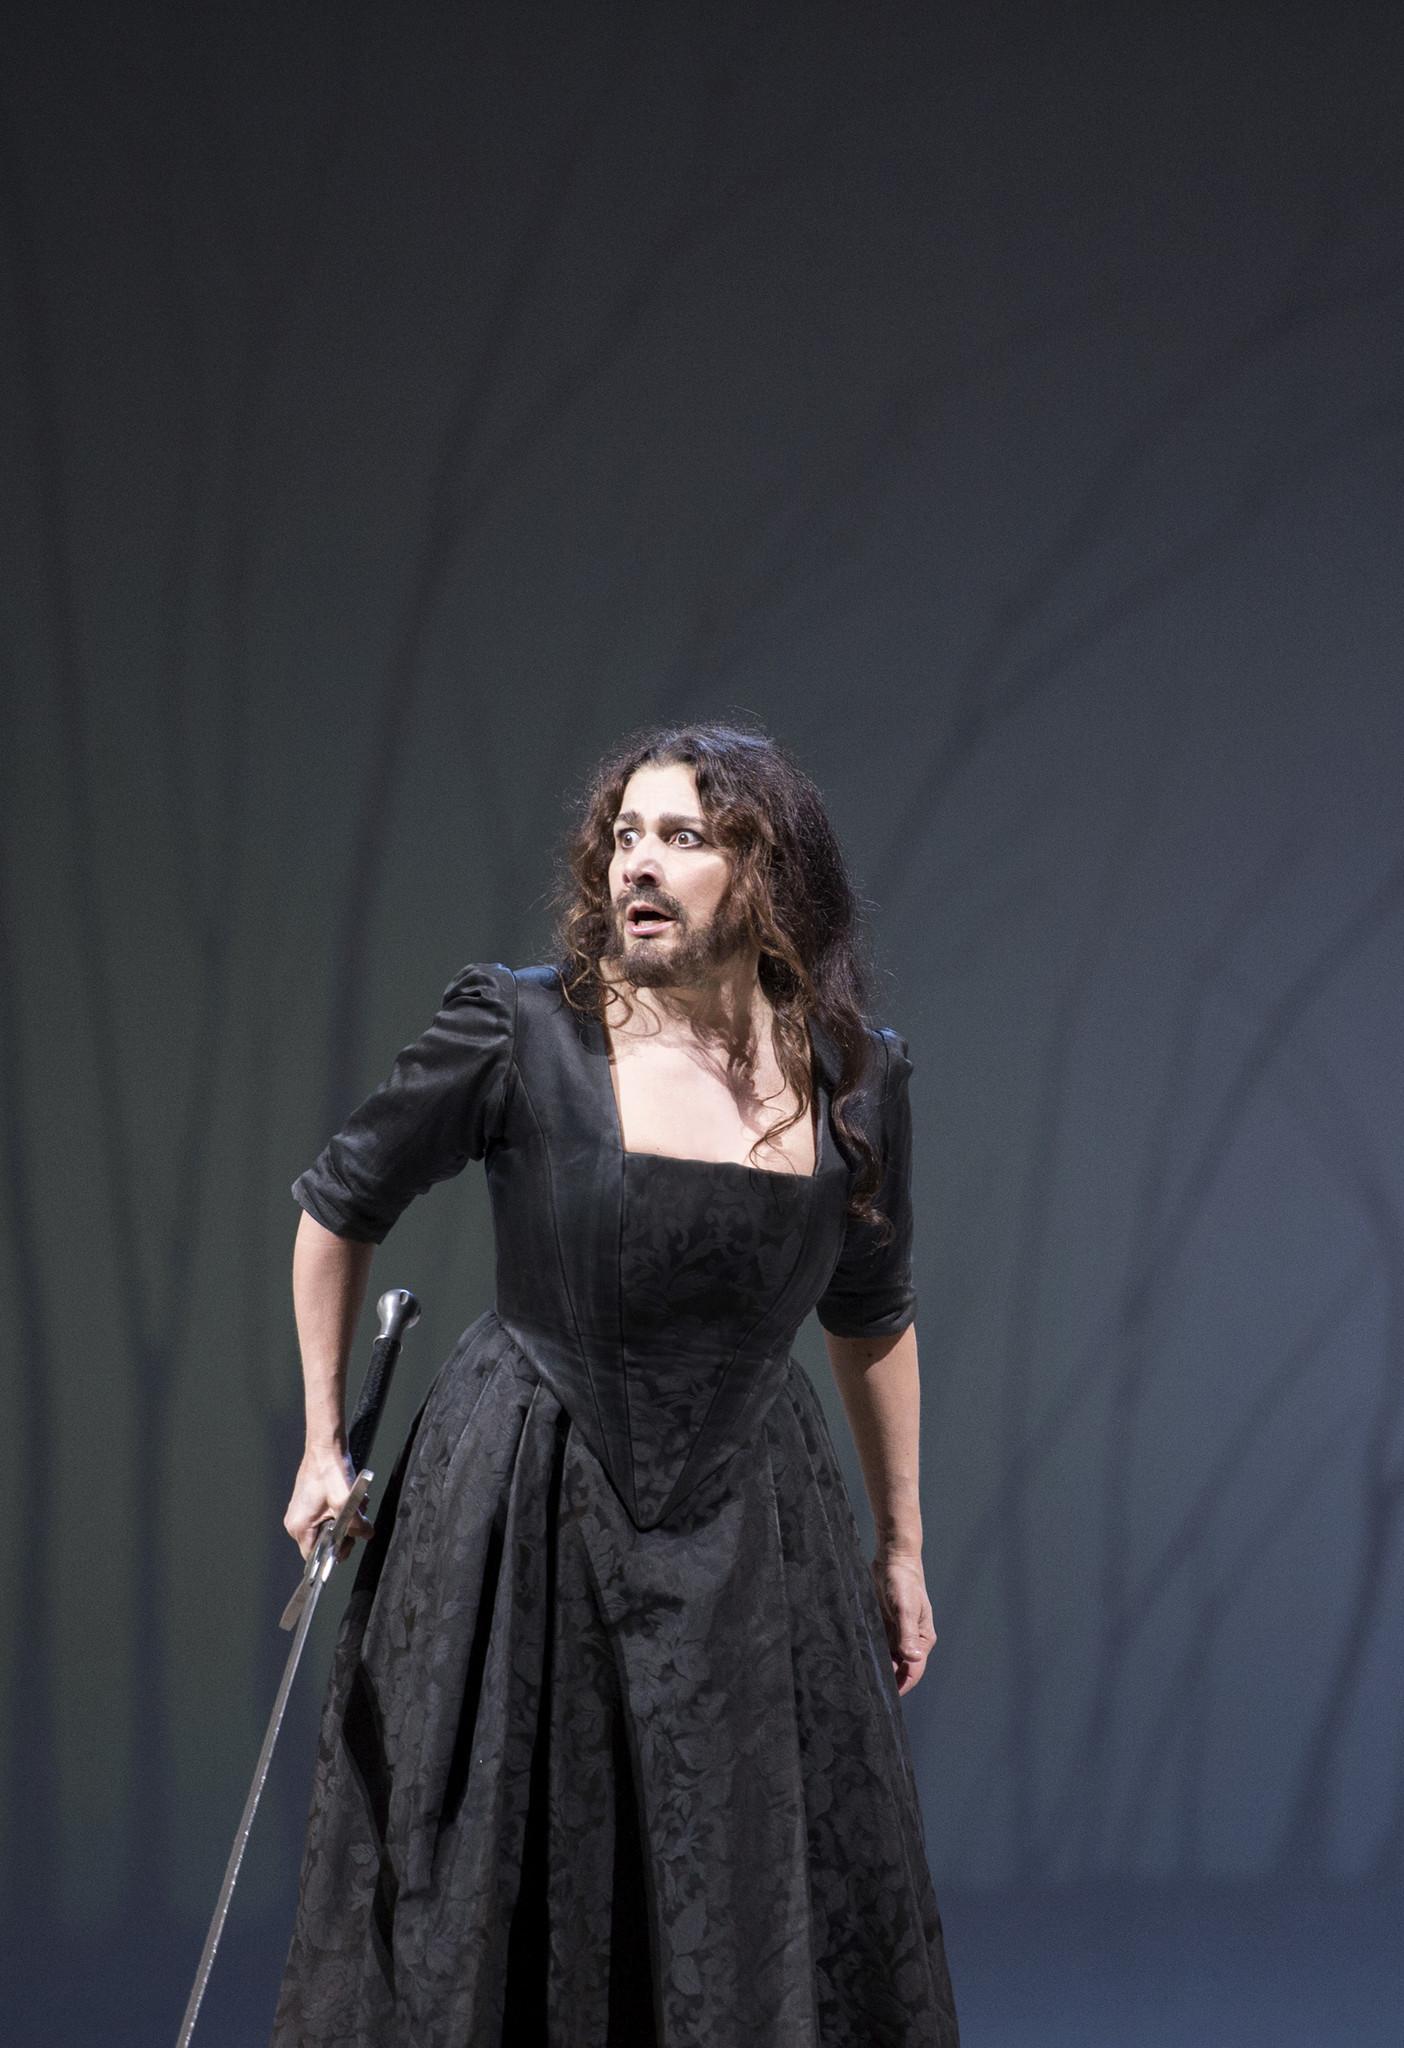 Cecilia Bartoli as Ariodante in Christof Loy's production of Handel's 'Ariodante' at the Salzburg Festival.